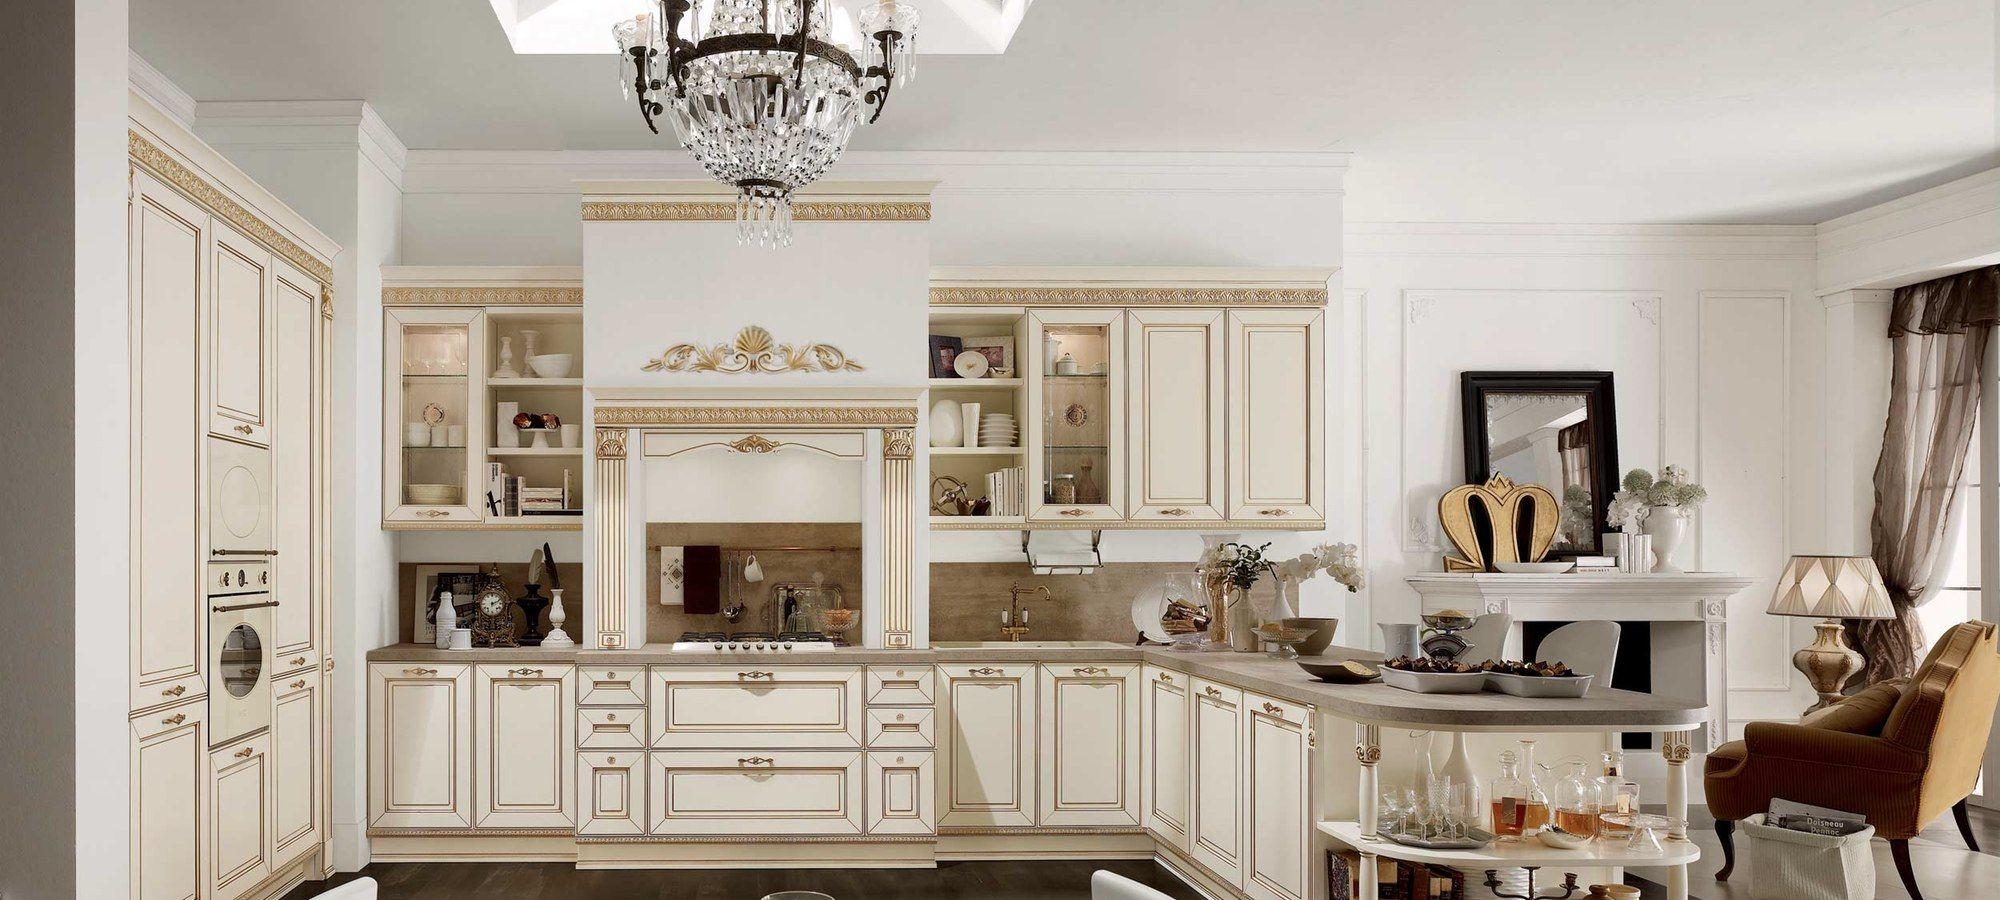 stosa-cucine-classiche-dolcevita-70.jpg (2000×900) | Kitchen Classic ...